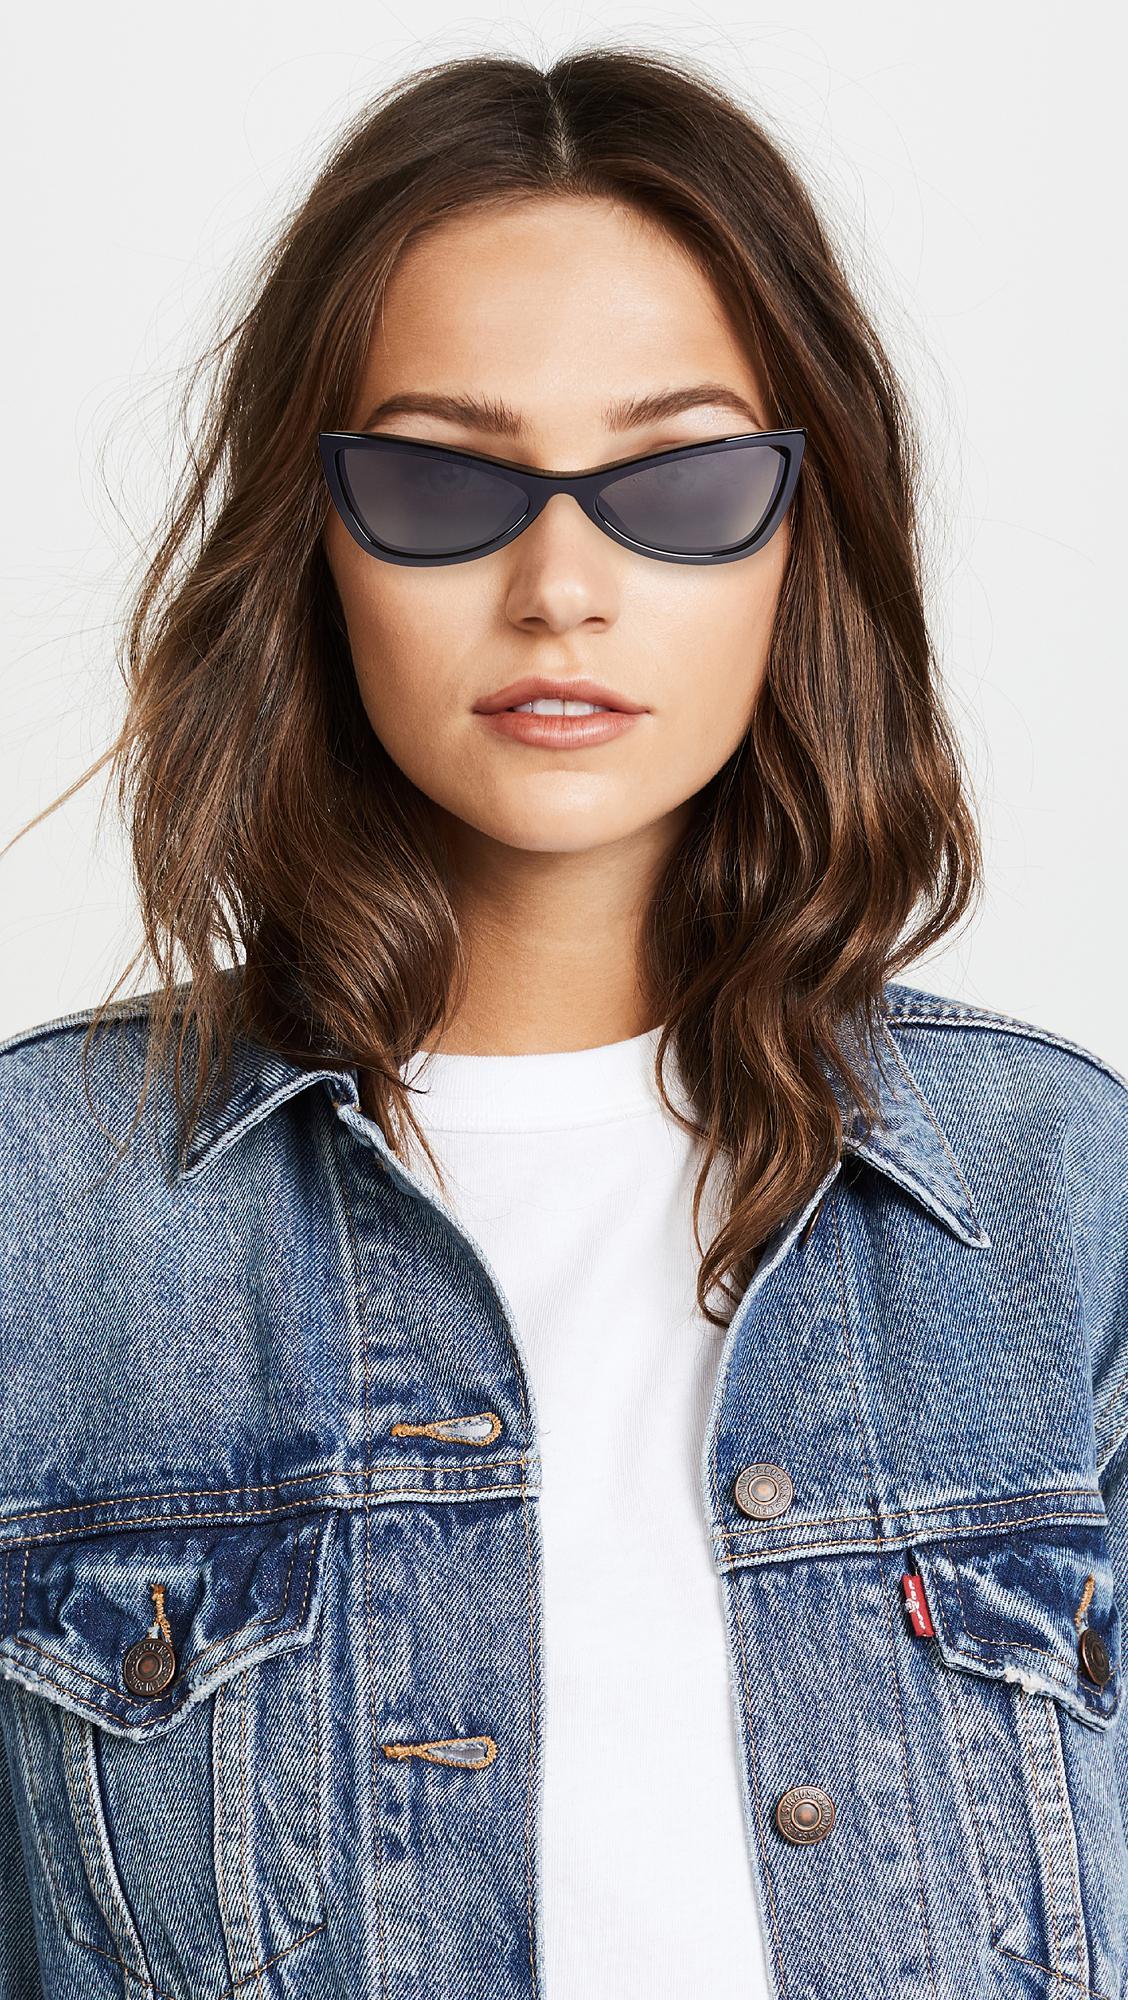 fa8fefc43f1 Balenciaga - Black Extreme Cat Eye Sunglasses - Lyst. View fullscreen